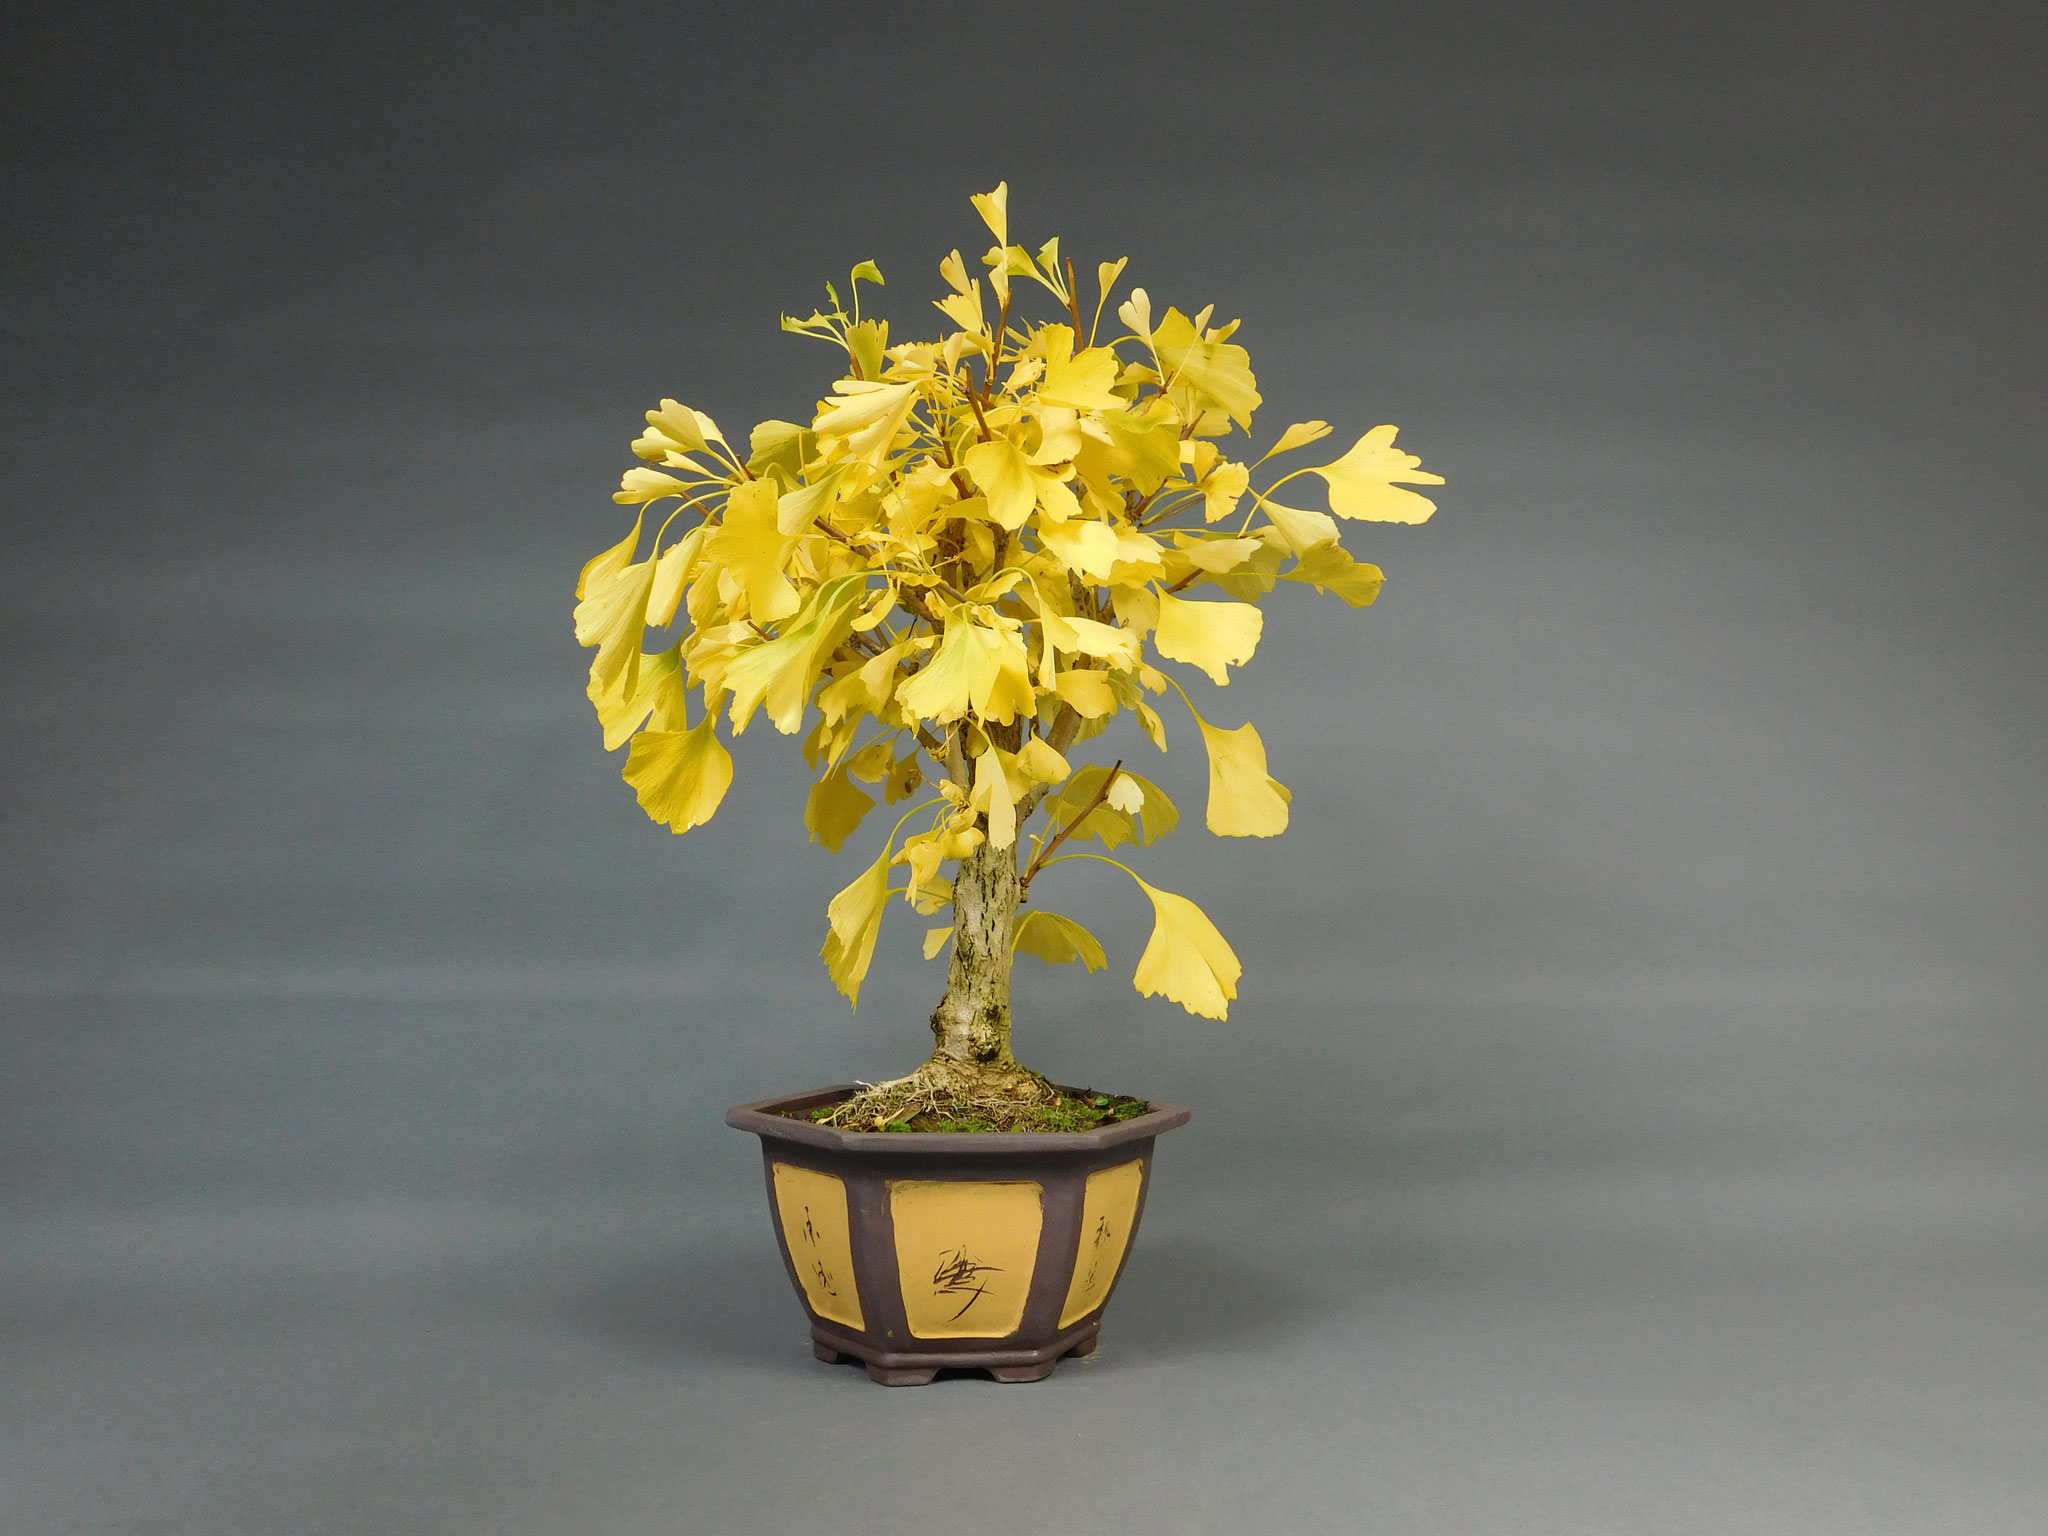 Fächerblattbaum, Ginkgo biloba